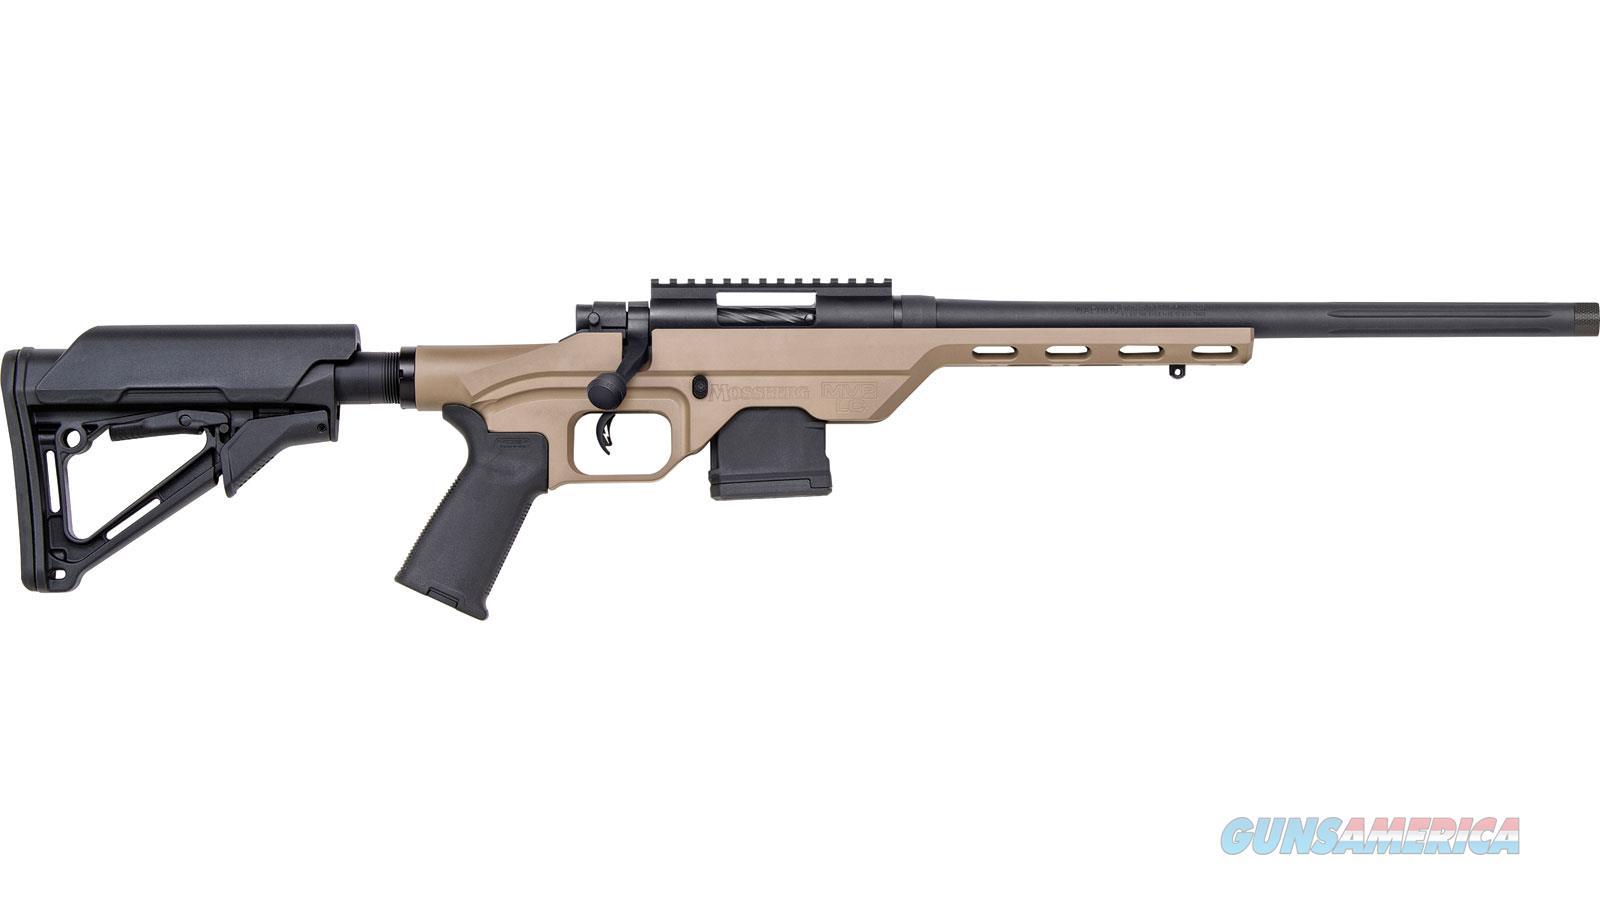 Mossberg Mvp 5.56 16.5 Mt Bl Light Chassis 28016  Guns > Rifles > MN Misc Rifles